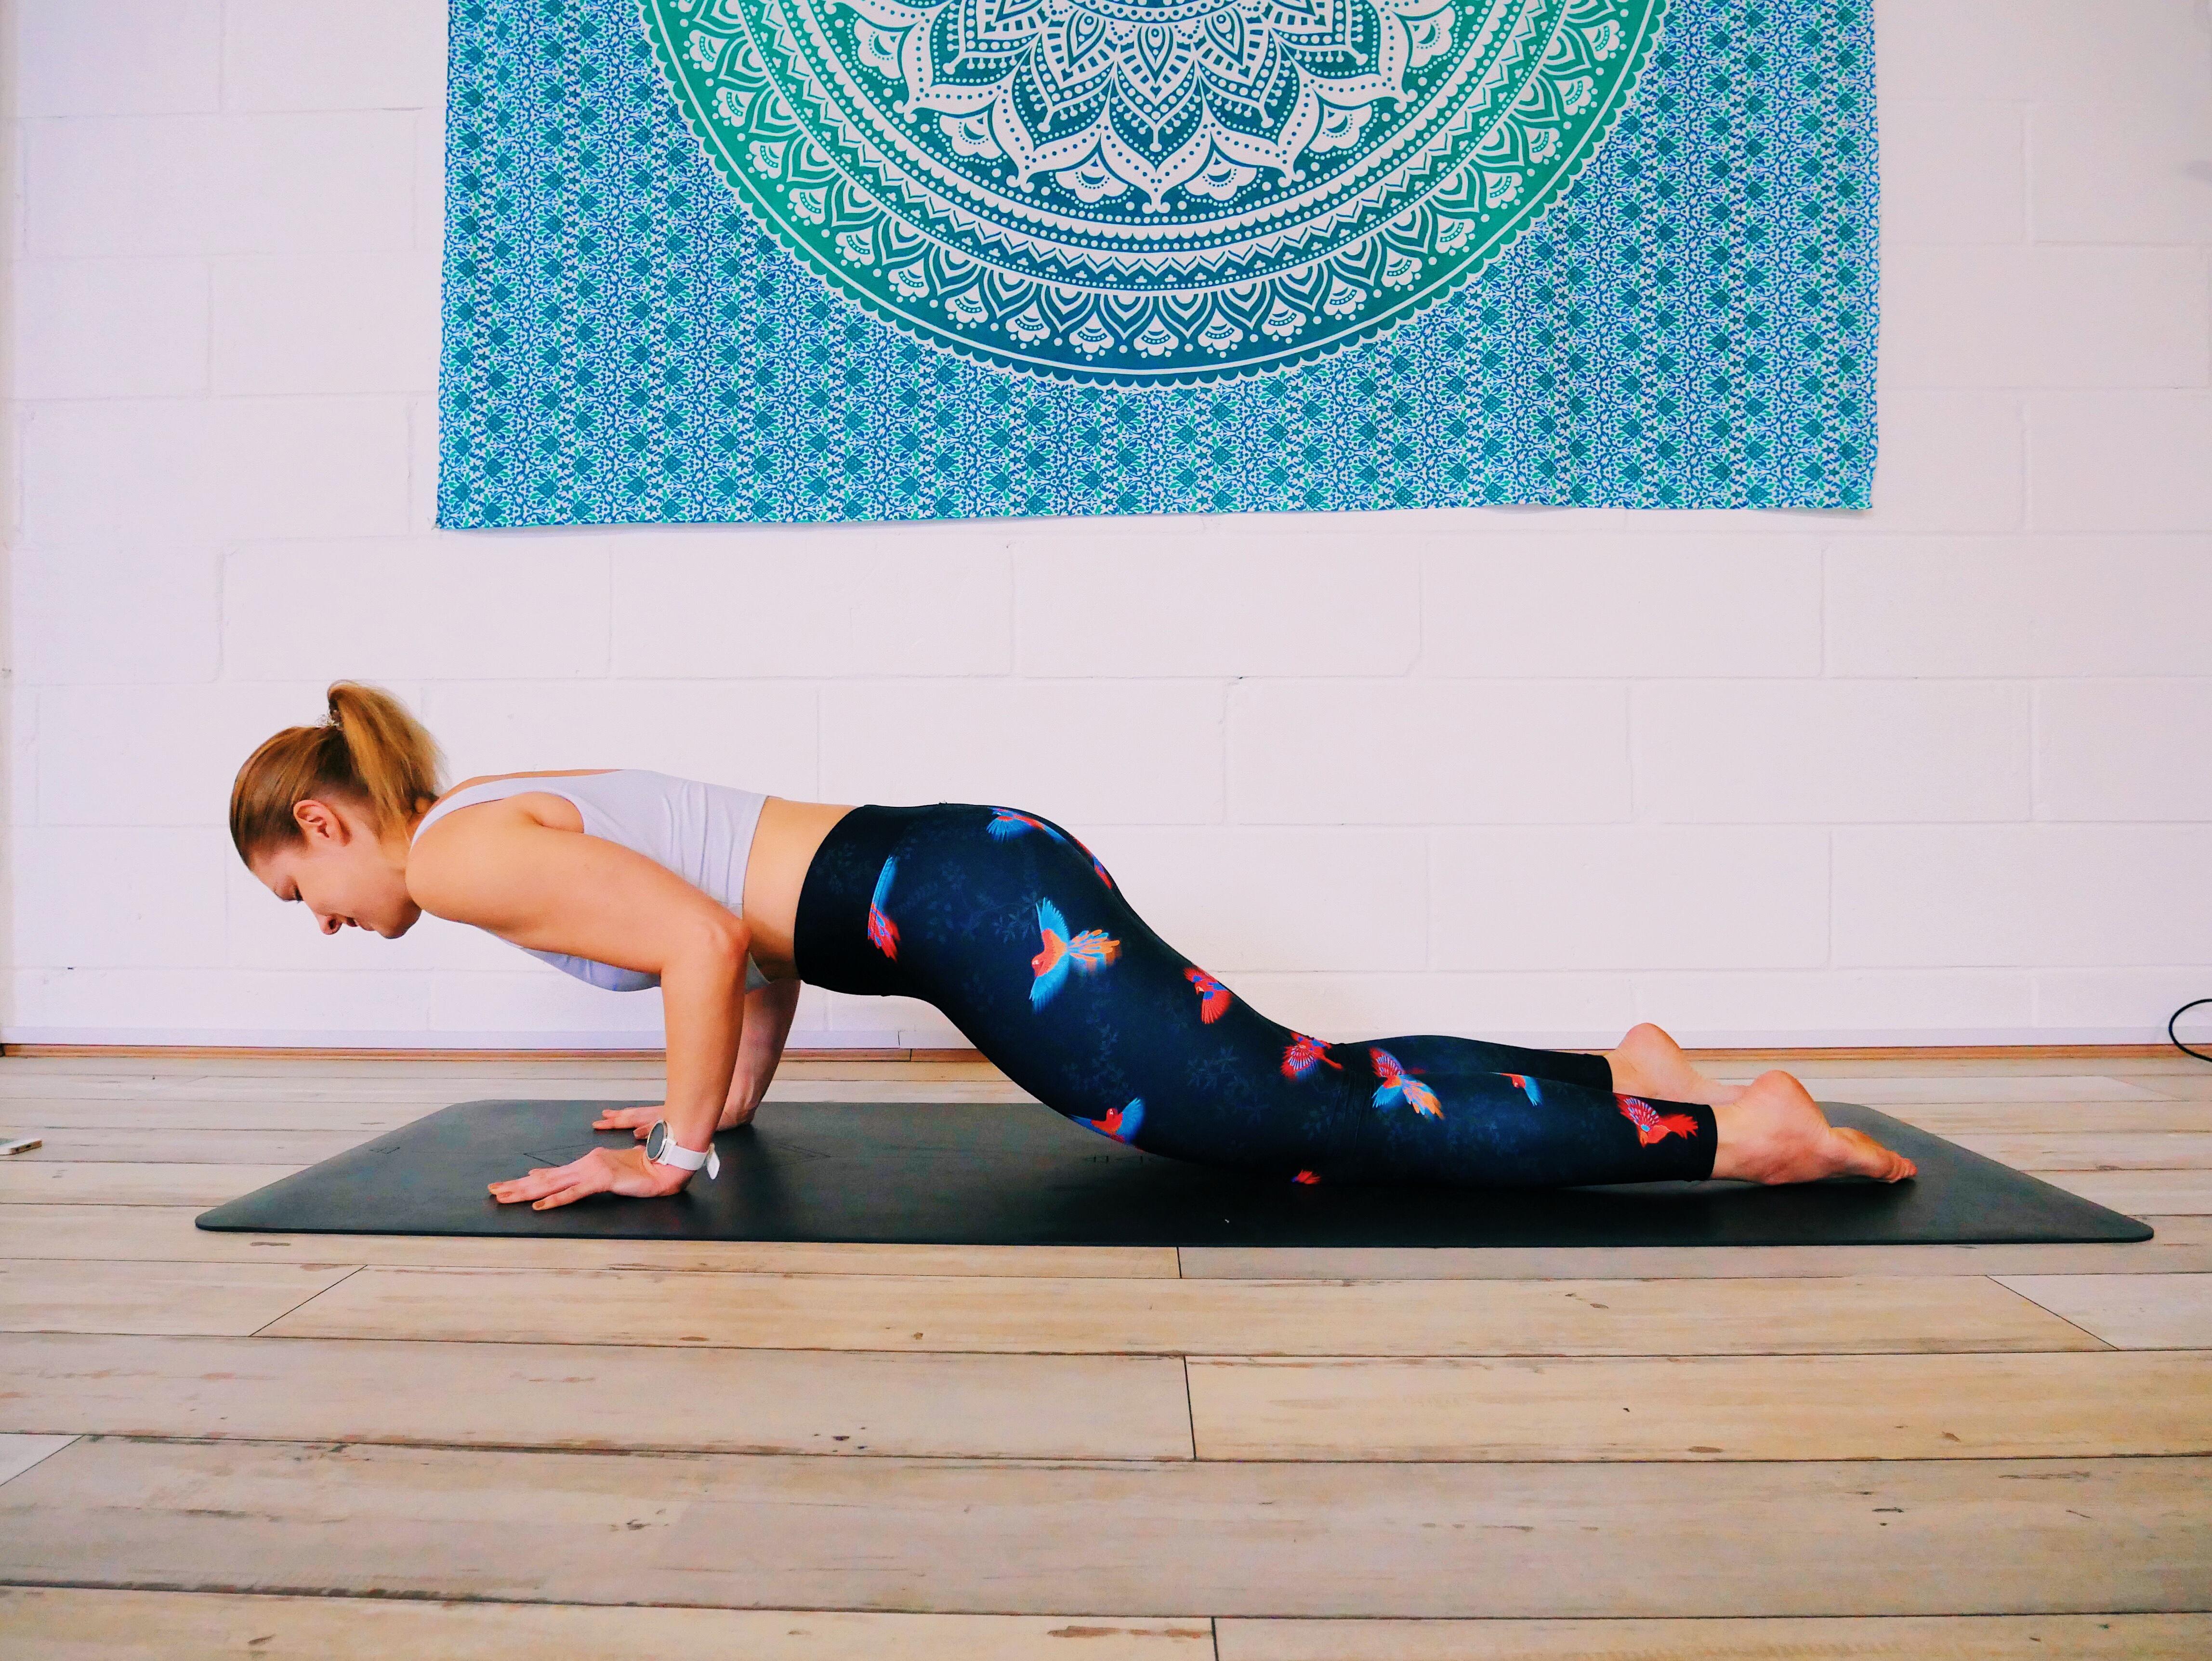 How to modify chaturanga yoga pose knees down